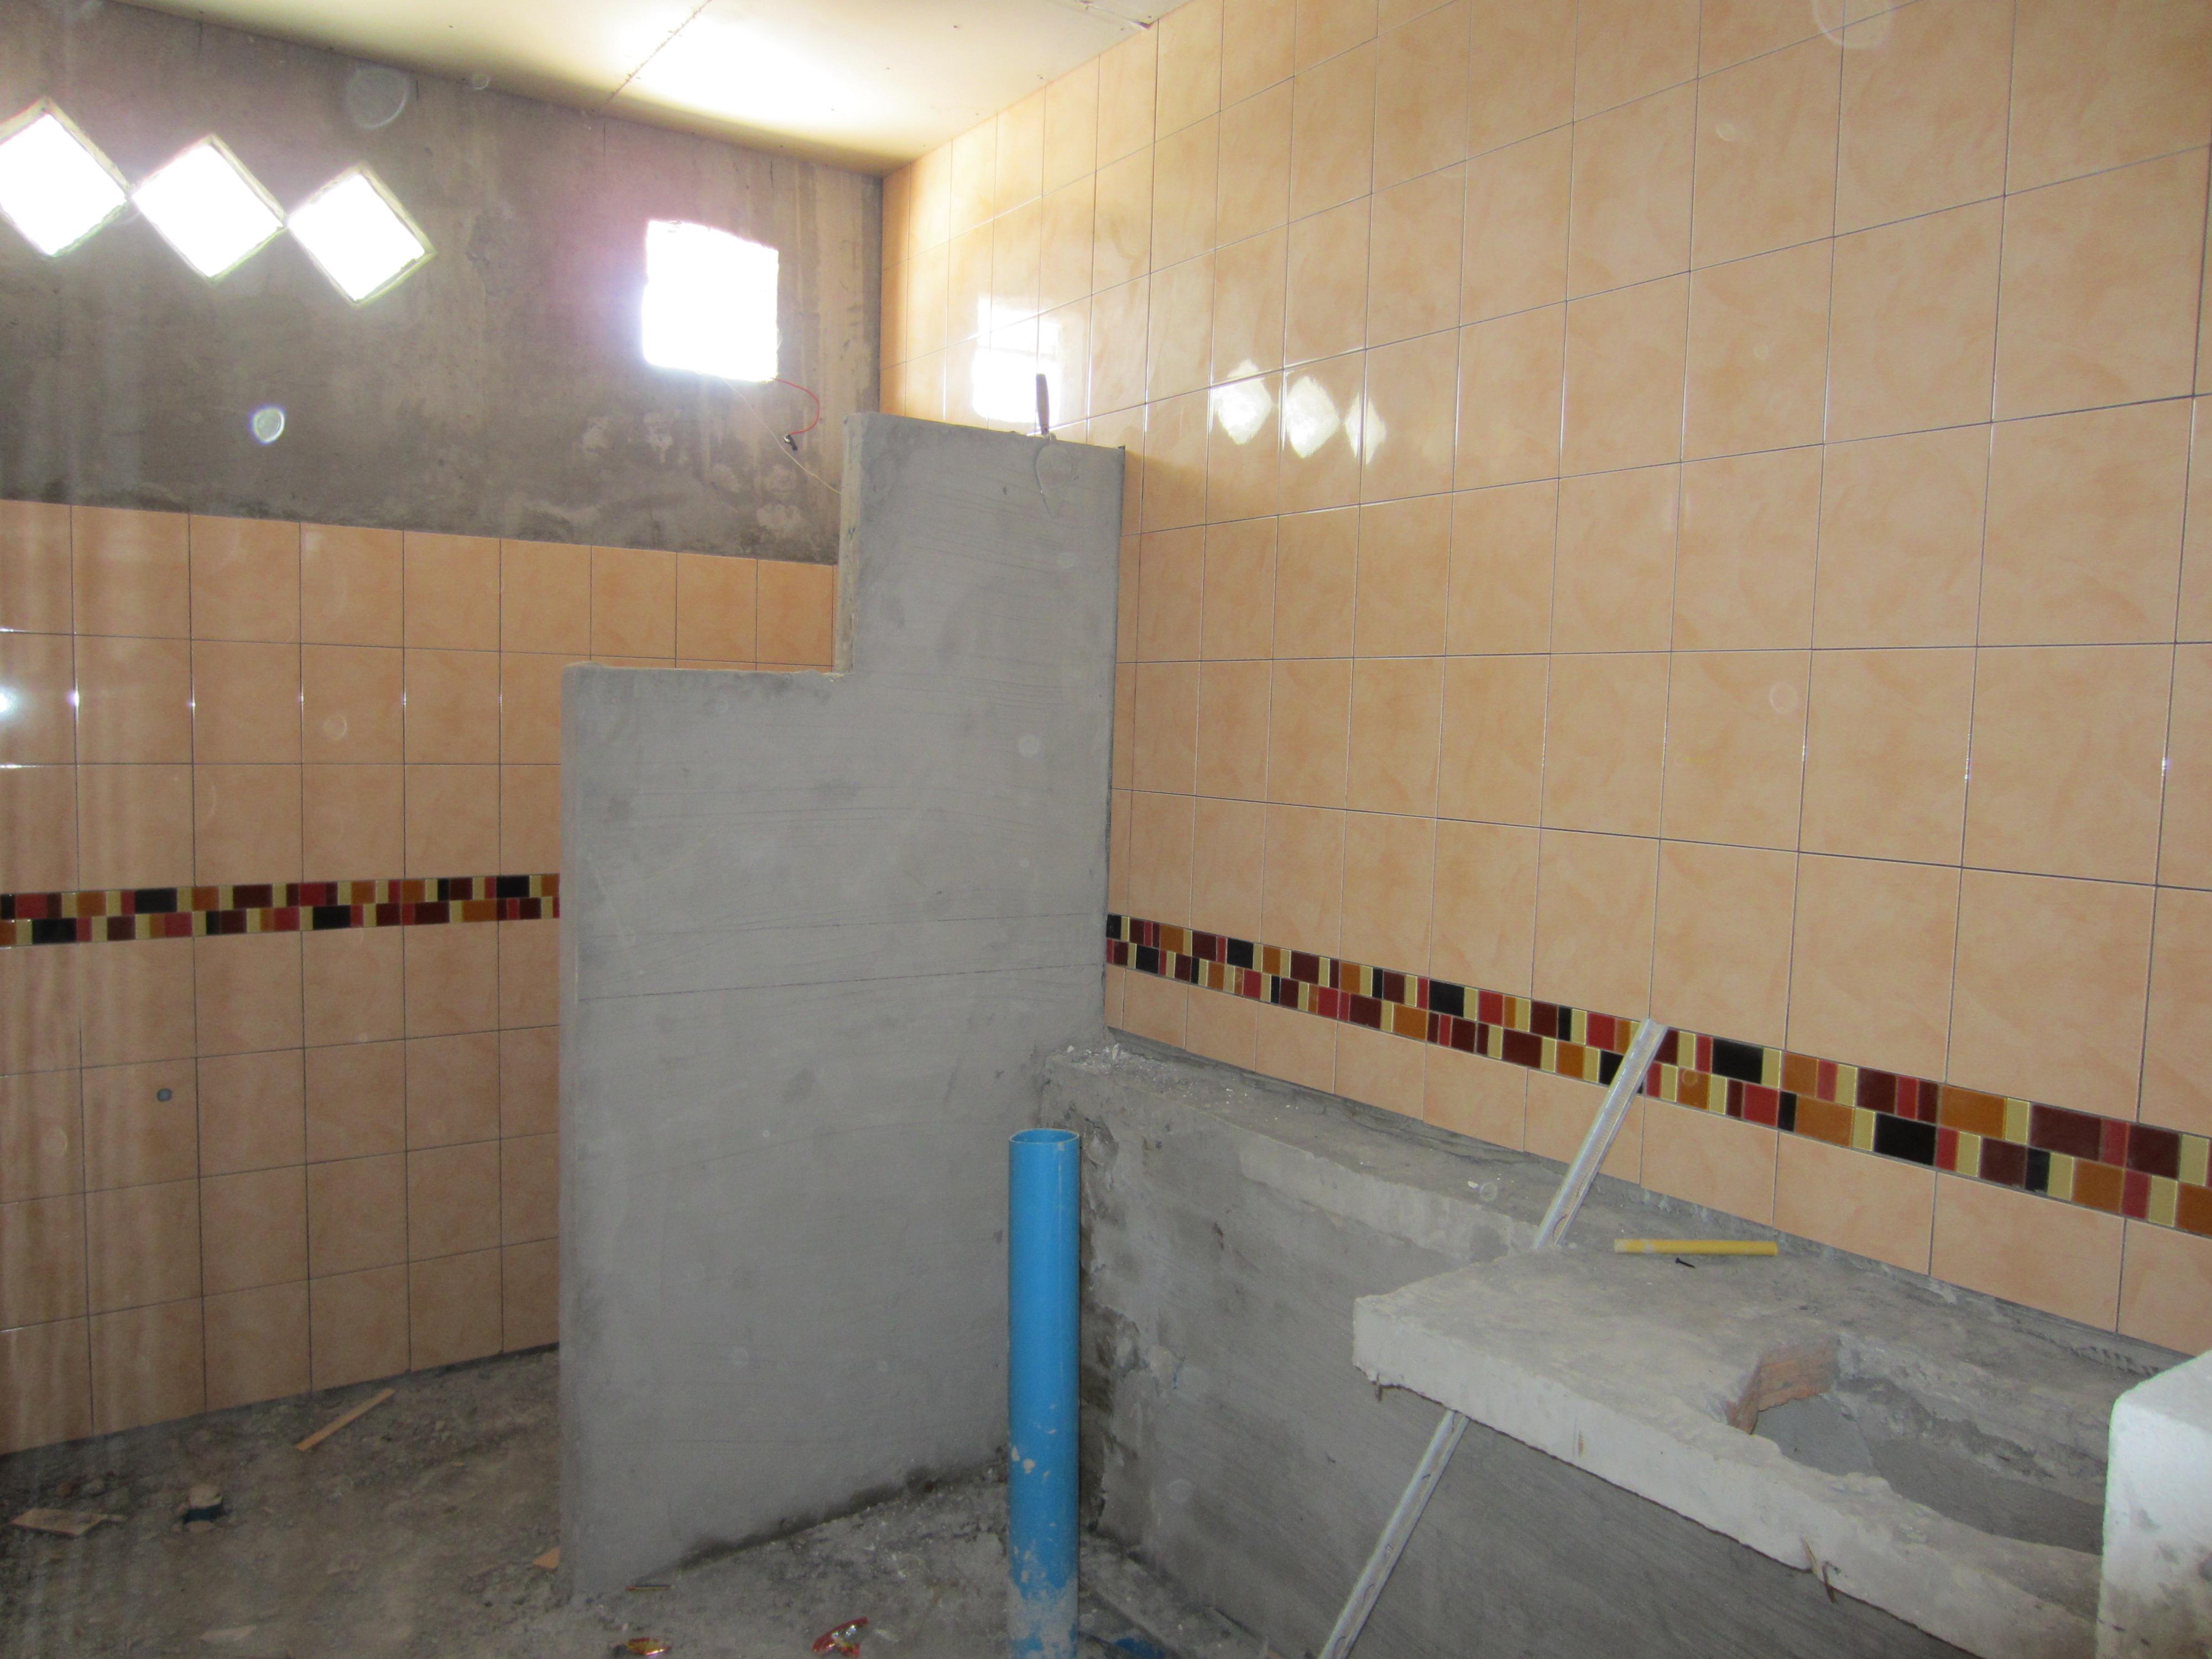 Bathroom build